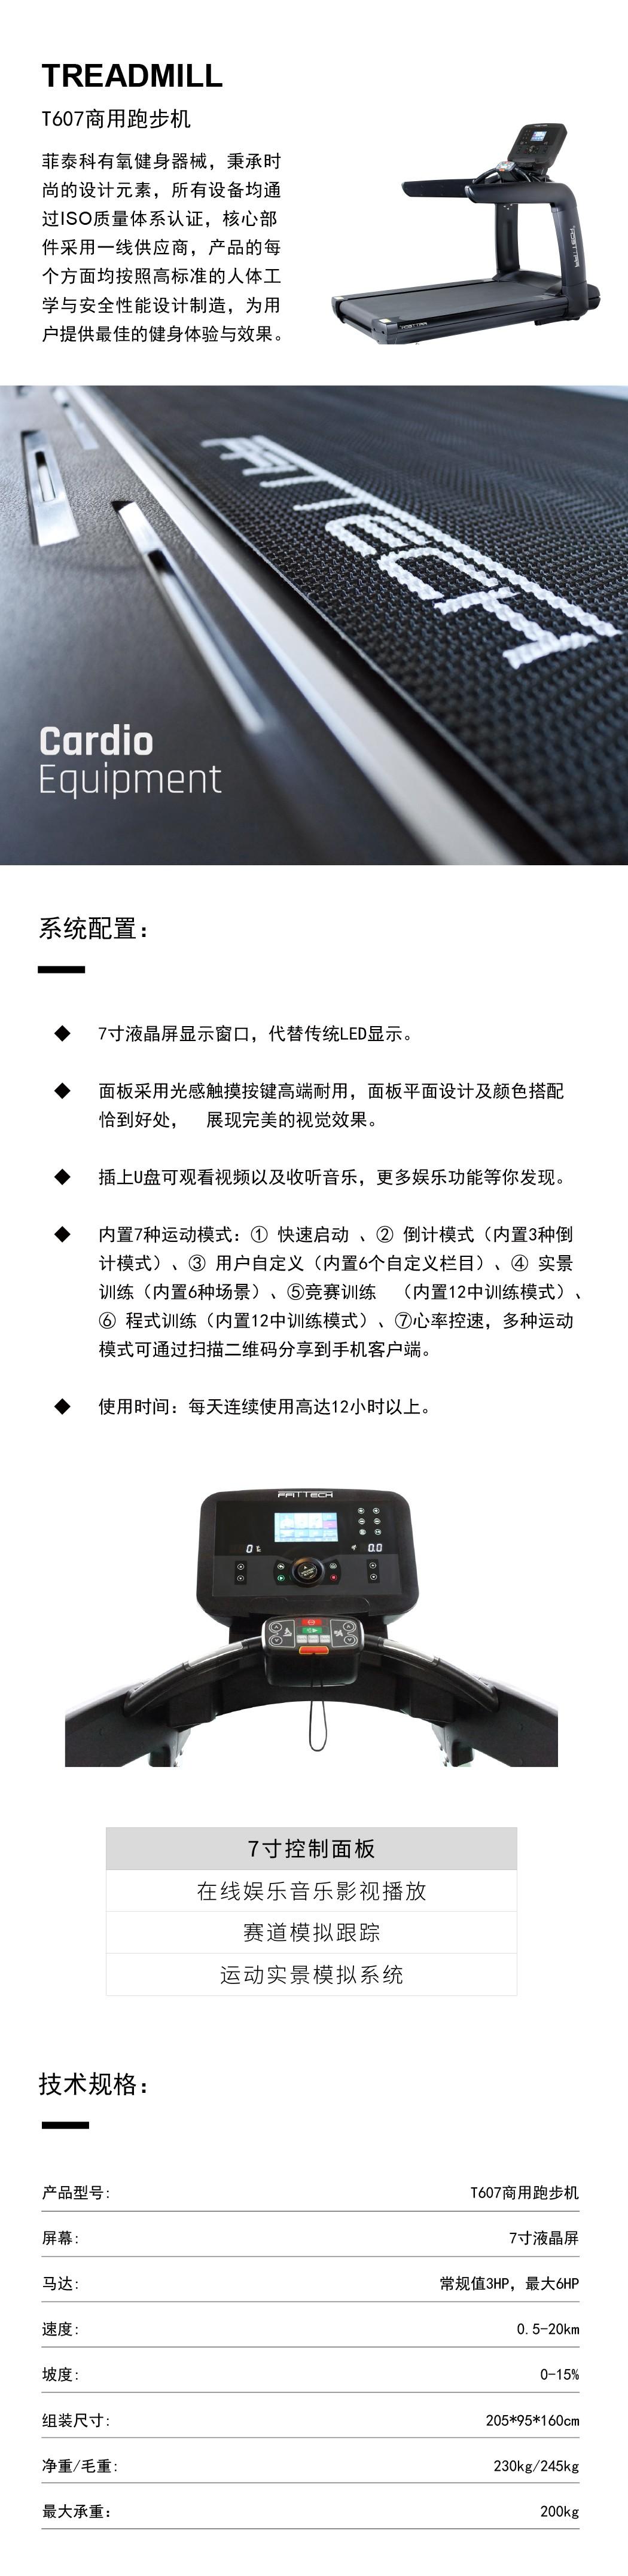 T607商务跑步机.jpg